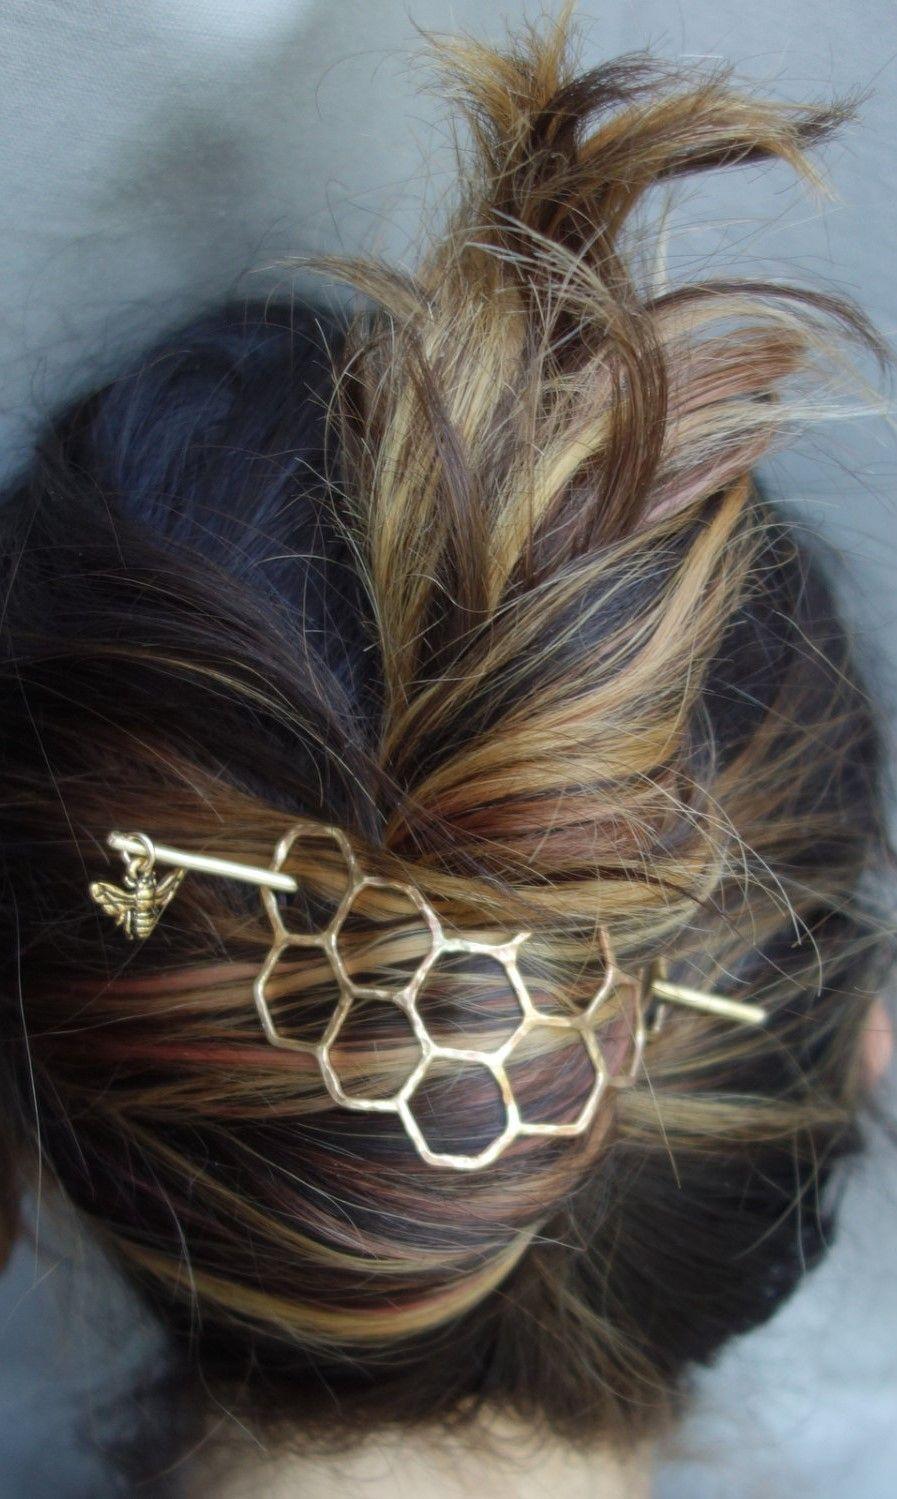 Large Brass Honeycomb Handmade Hair Bun Slide Pin With